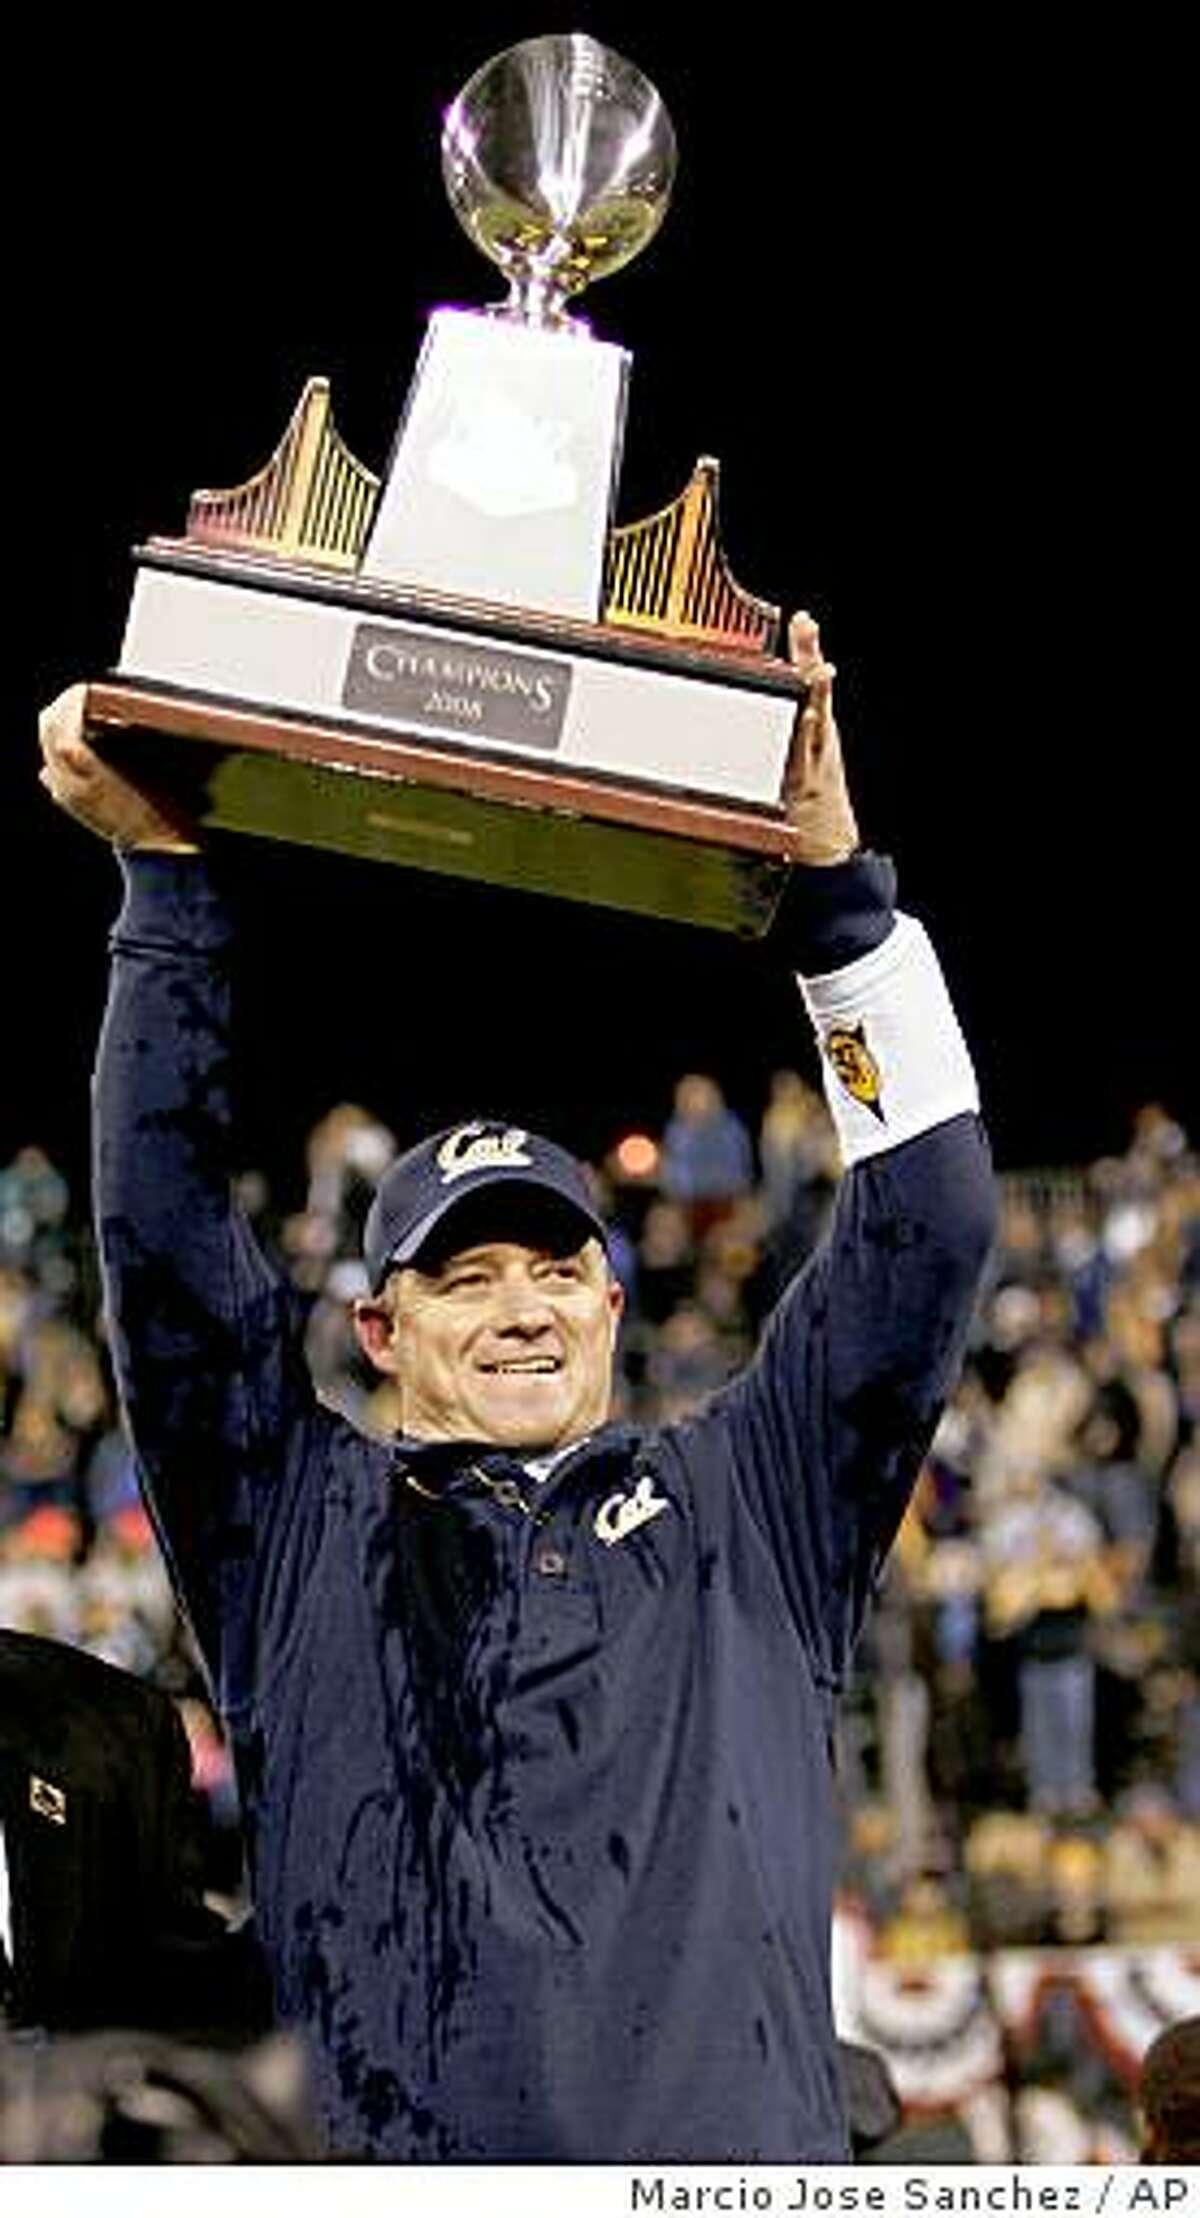 California head coach Jeff Tedford hoists the winner's trophy after a win over Miami in the Emerald Bowl NCAA college football game in San Francisco, Saturday, Dec. 27, 2008. California won 24-17. (AP Photo/Marcio Jose Sanchez)